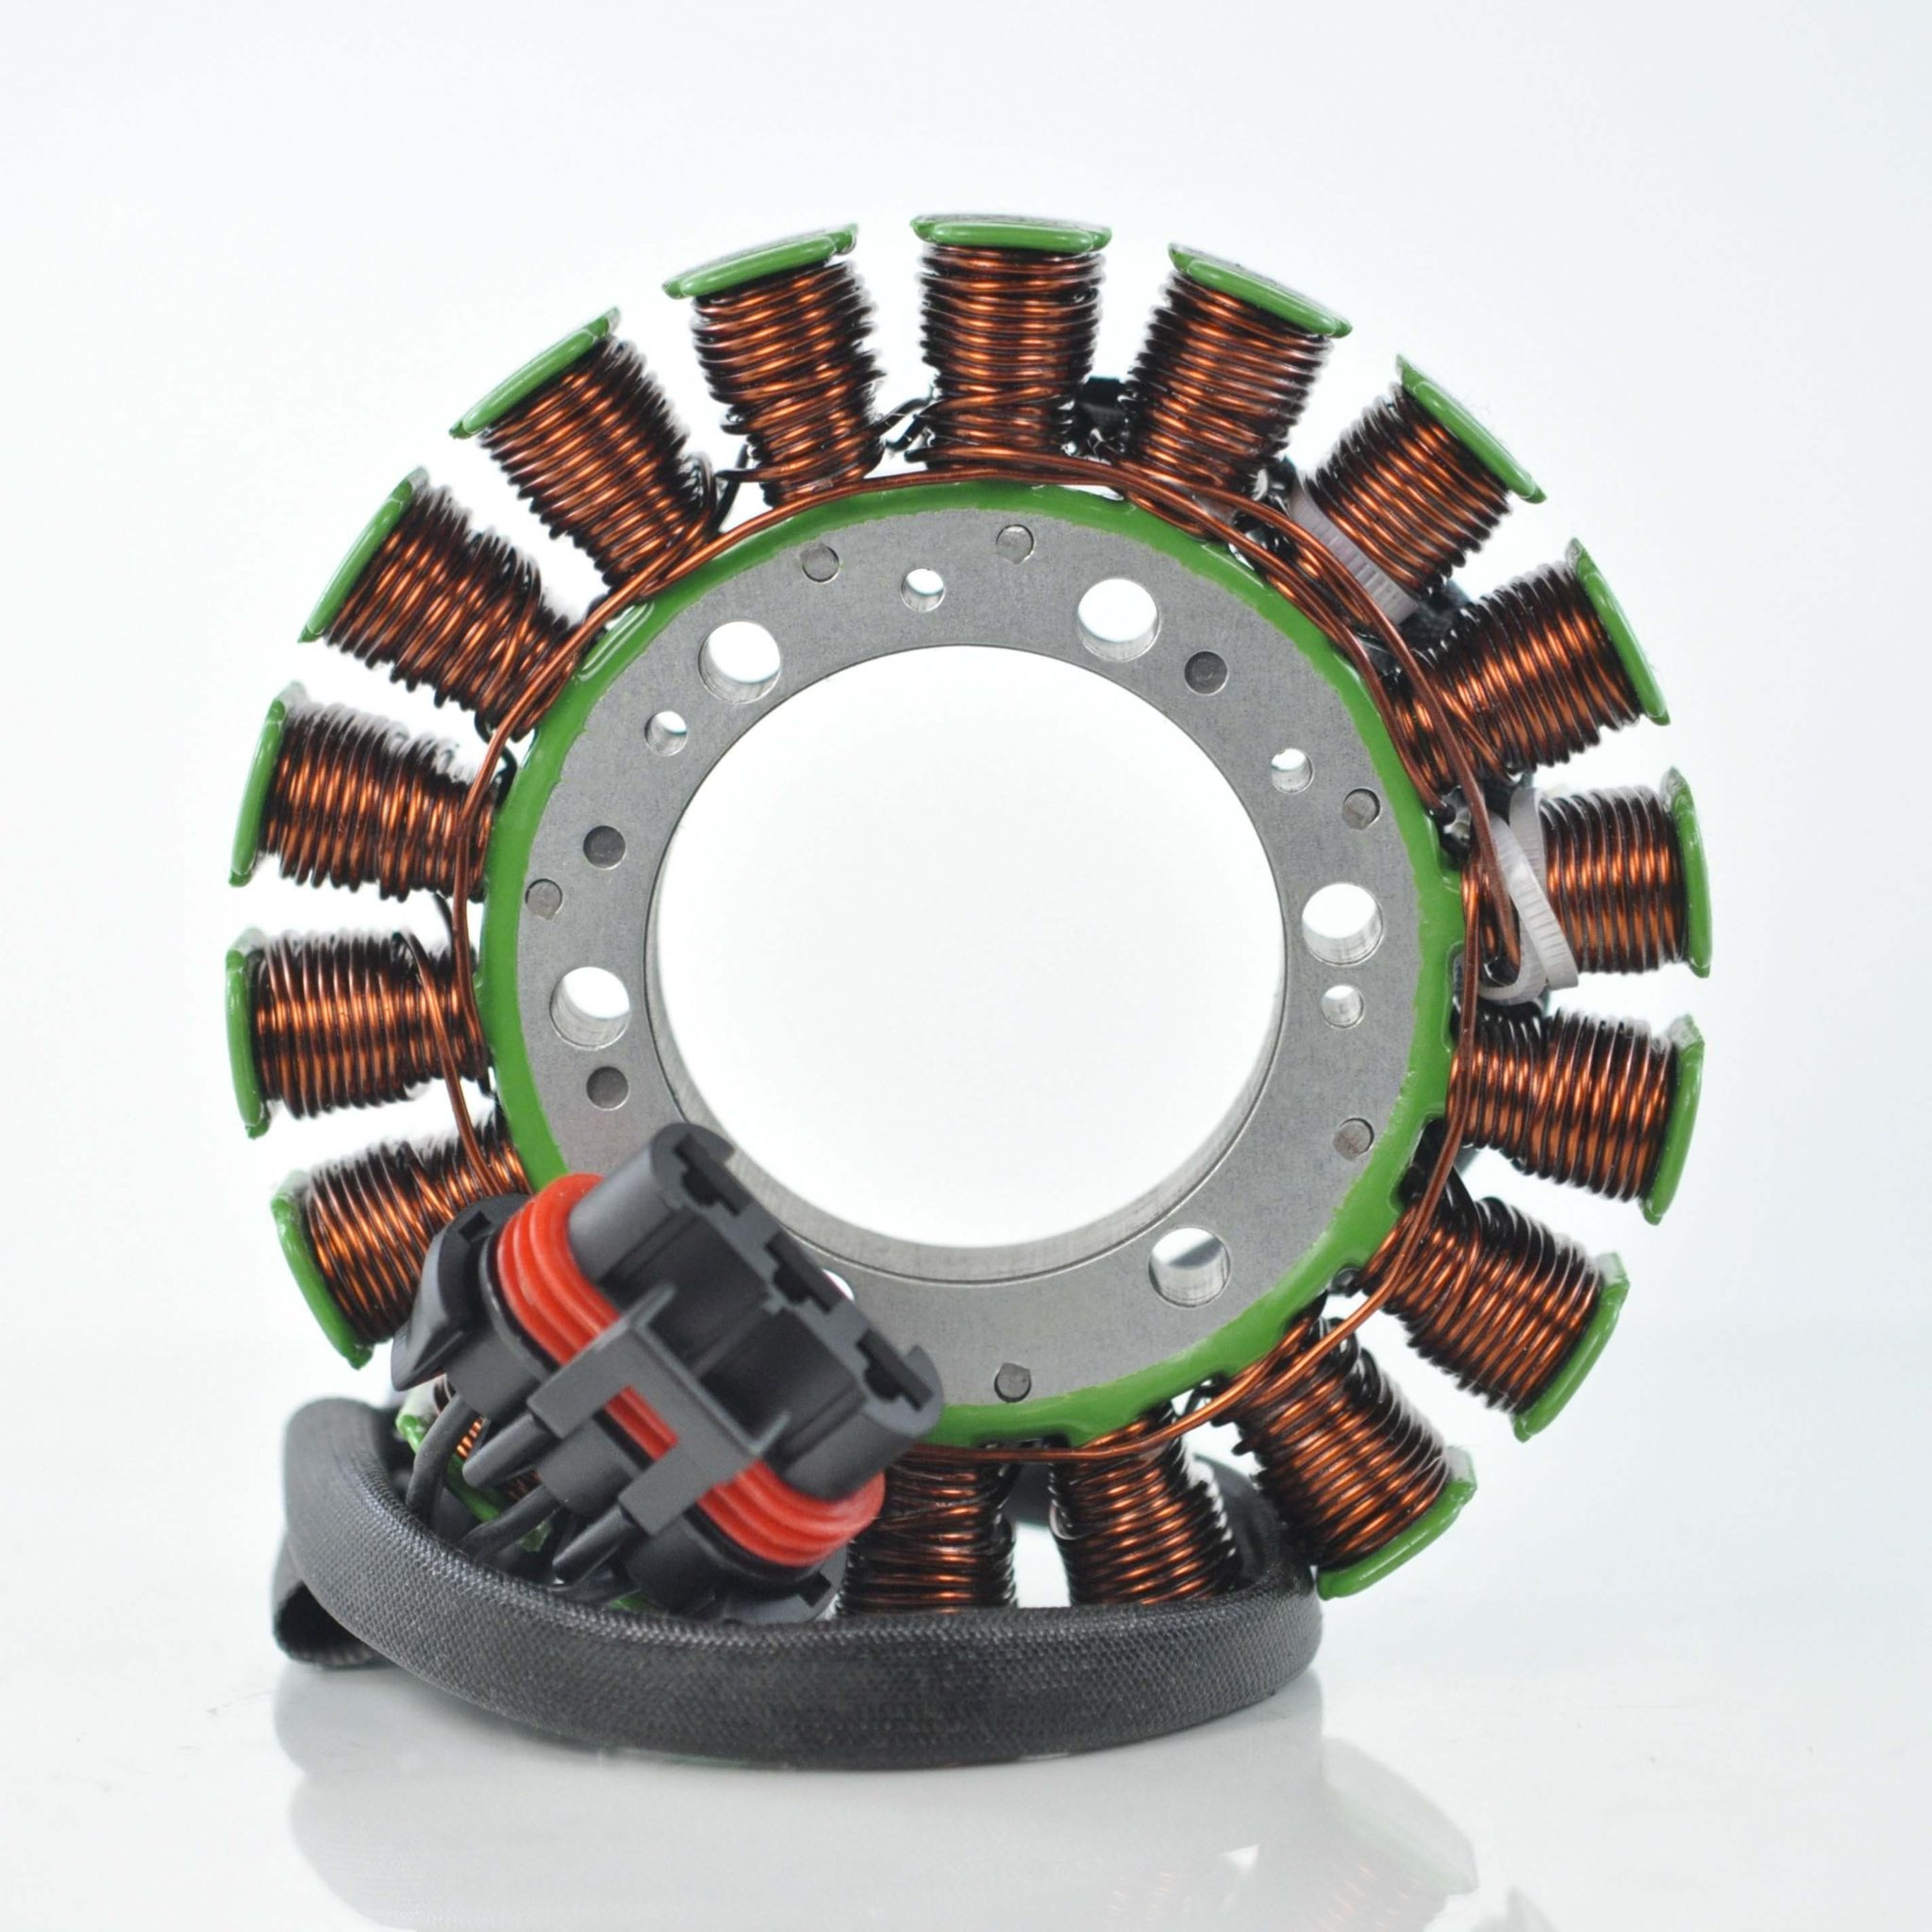 RZR 1000 Magneto Stator